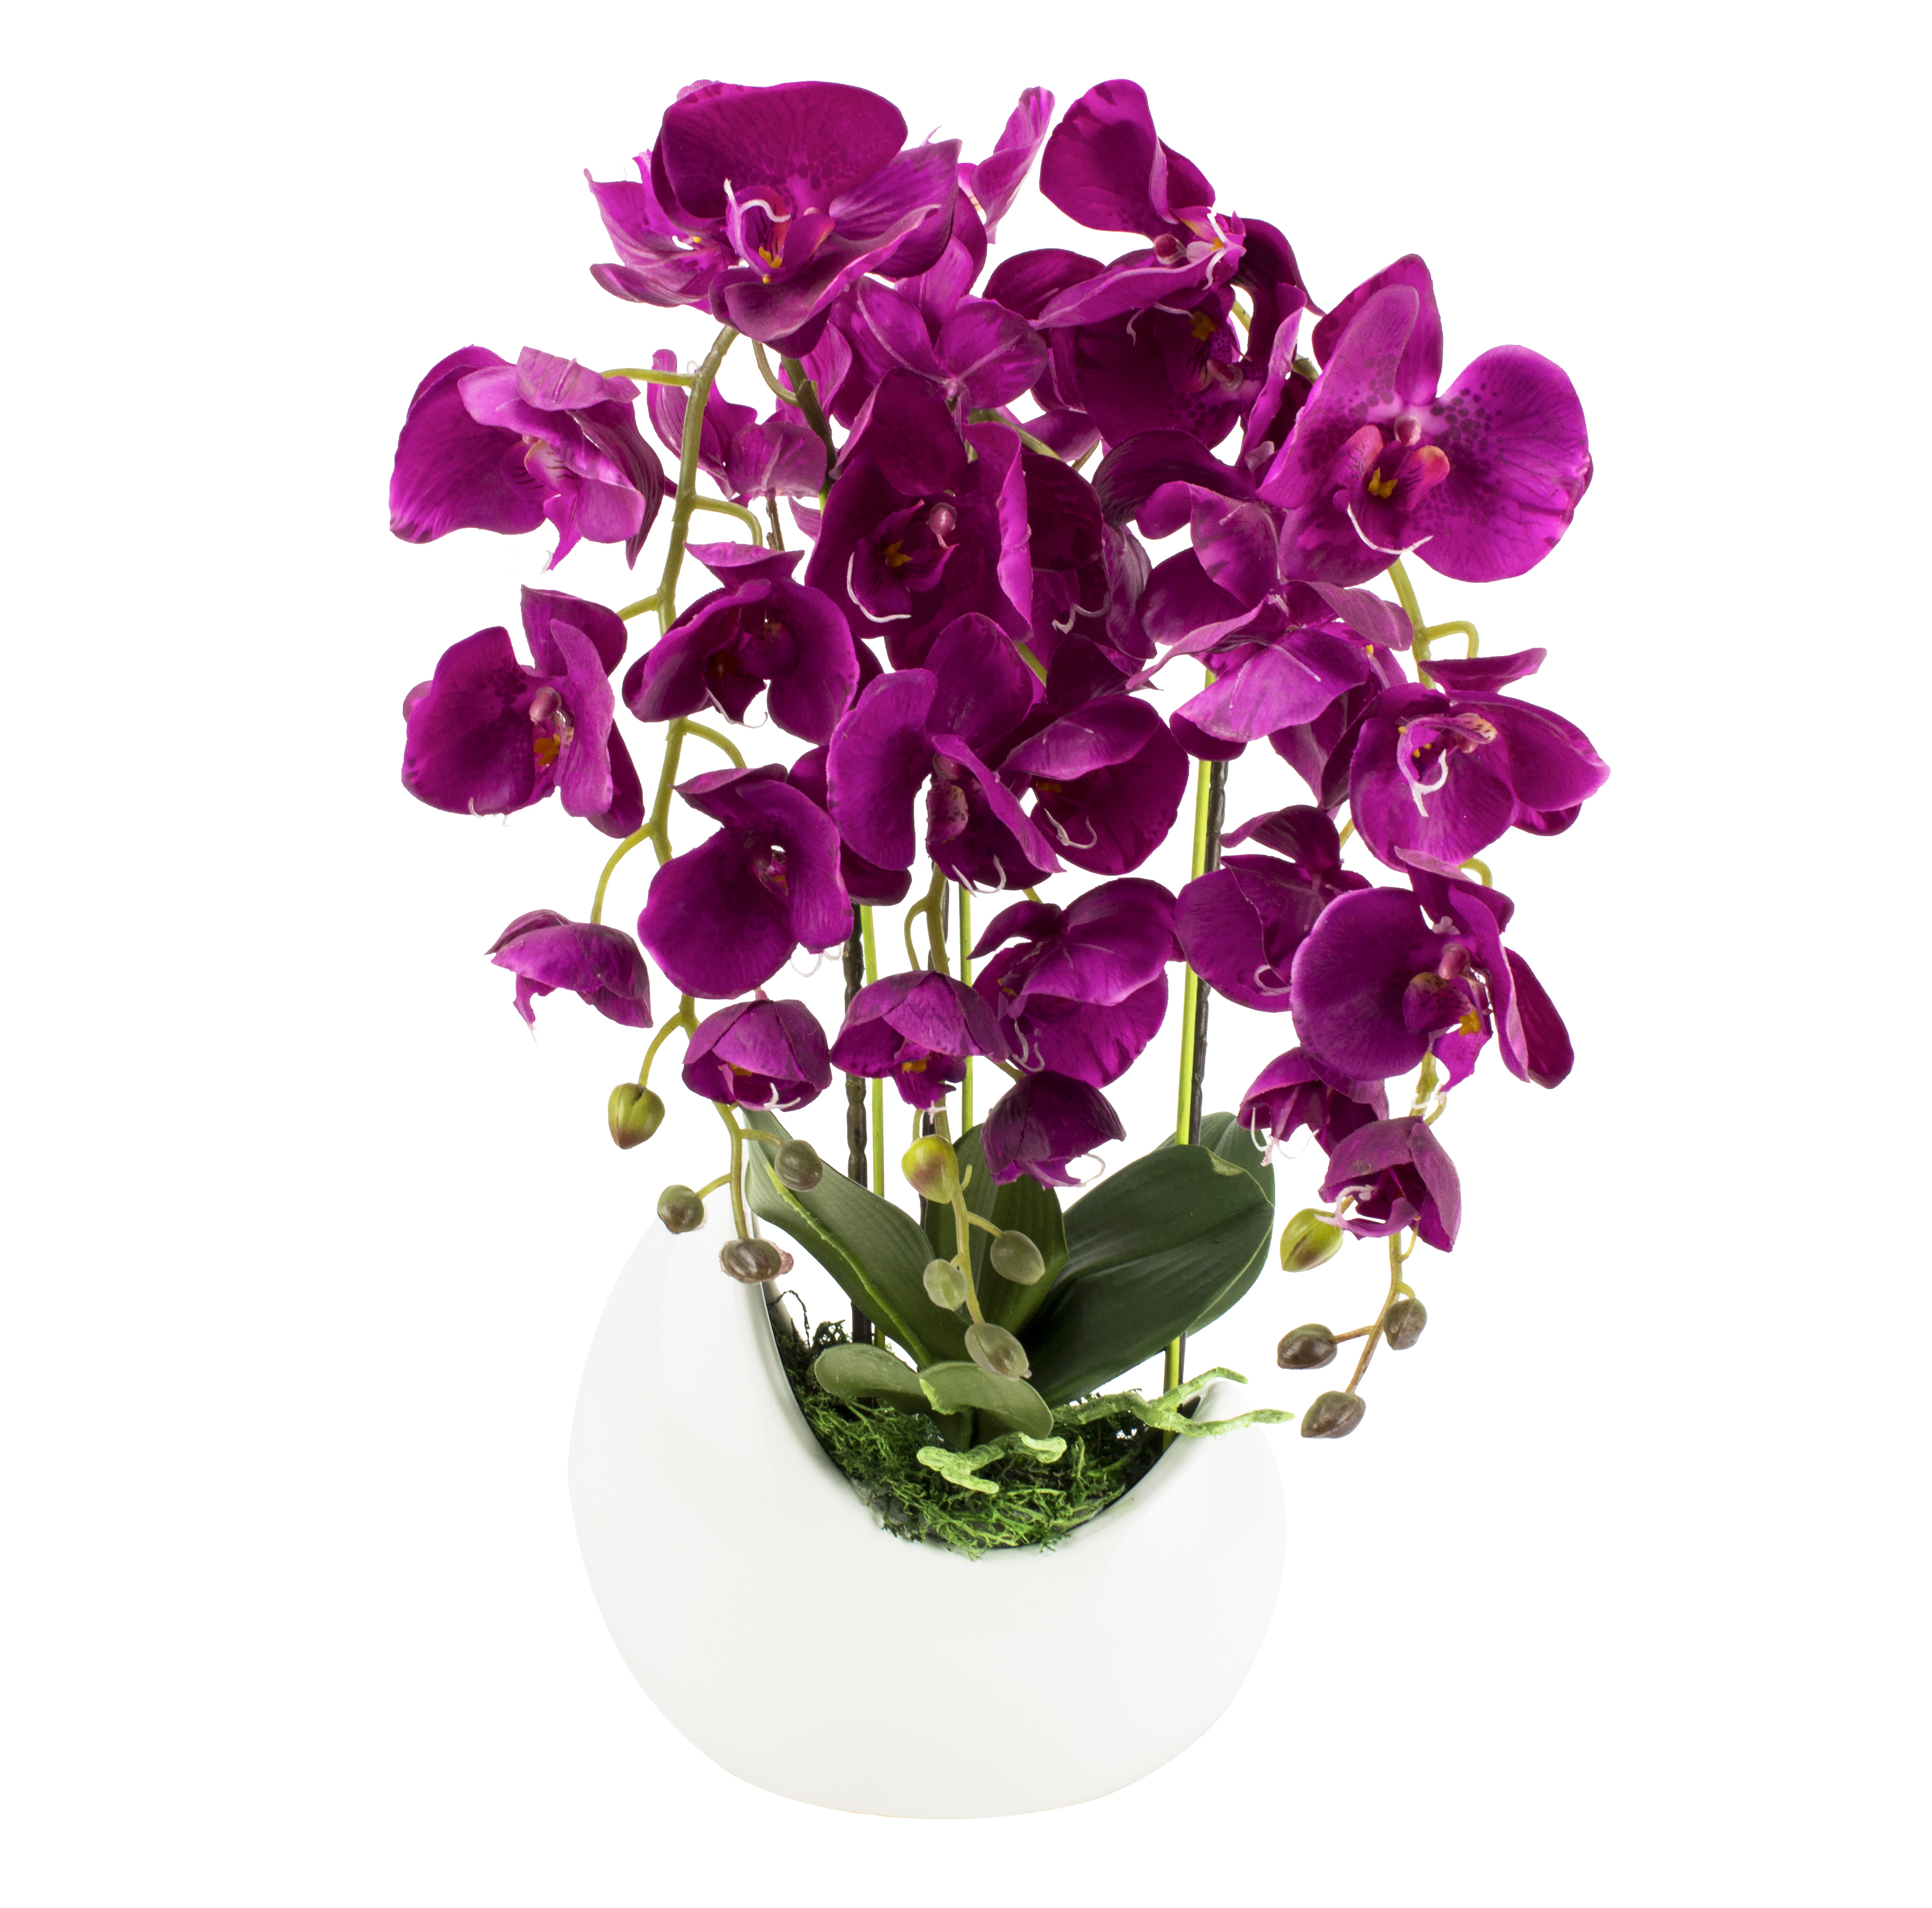 gesteck orchidee violett weiss kunstblumen vase fensterschmuck blumengesteck ebay. Black Bedroom Furniture Sets. Home Design Ideas